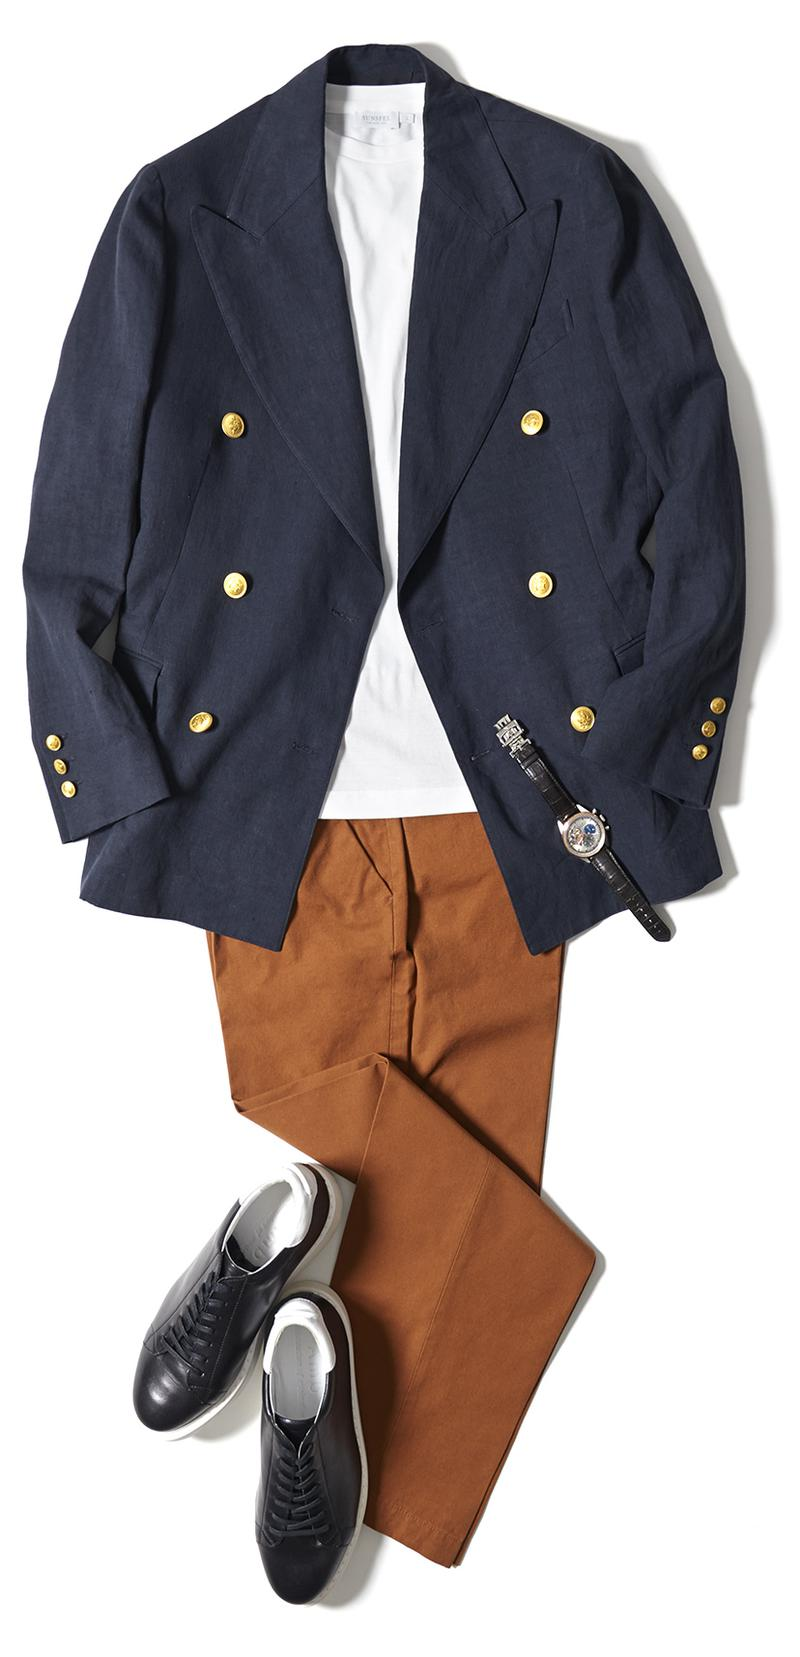 Tシャツ1万1000円/サンスペル、ジャケット15万5000円/マディソンブルー(マディソンブルー)、パンツ3万円/セラードア(グジ東京店)、時計121万円/ゼニス(ゼニス)、靴2万4000円/エーエムビー(ハイブリッジ インターナショナル)